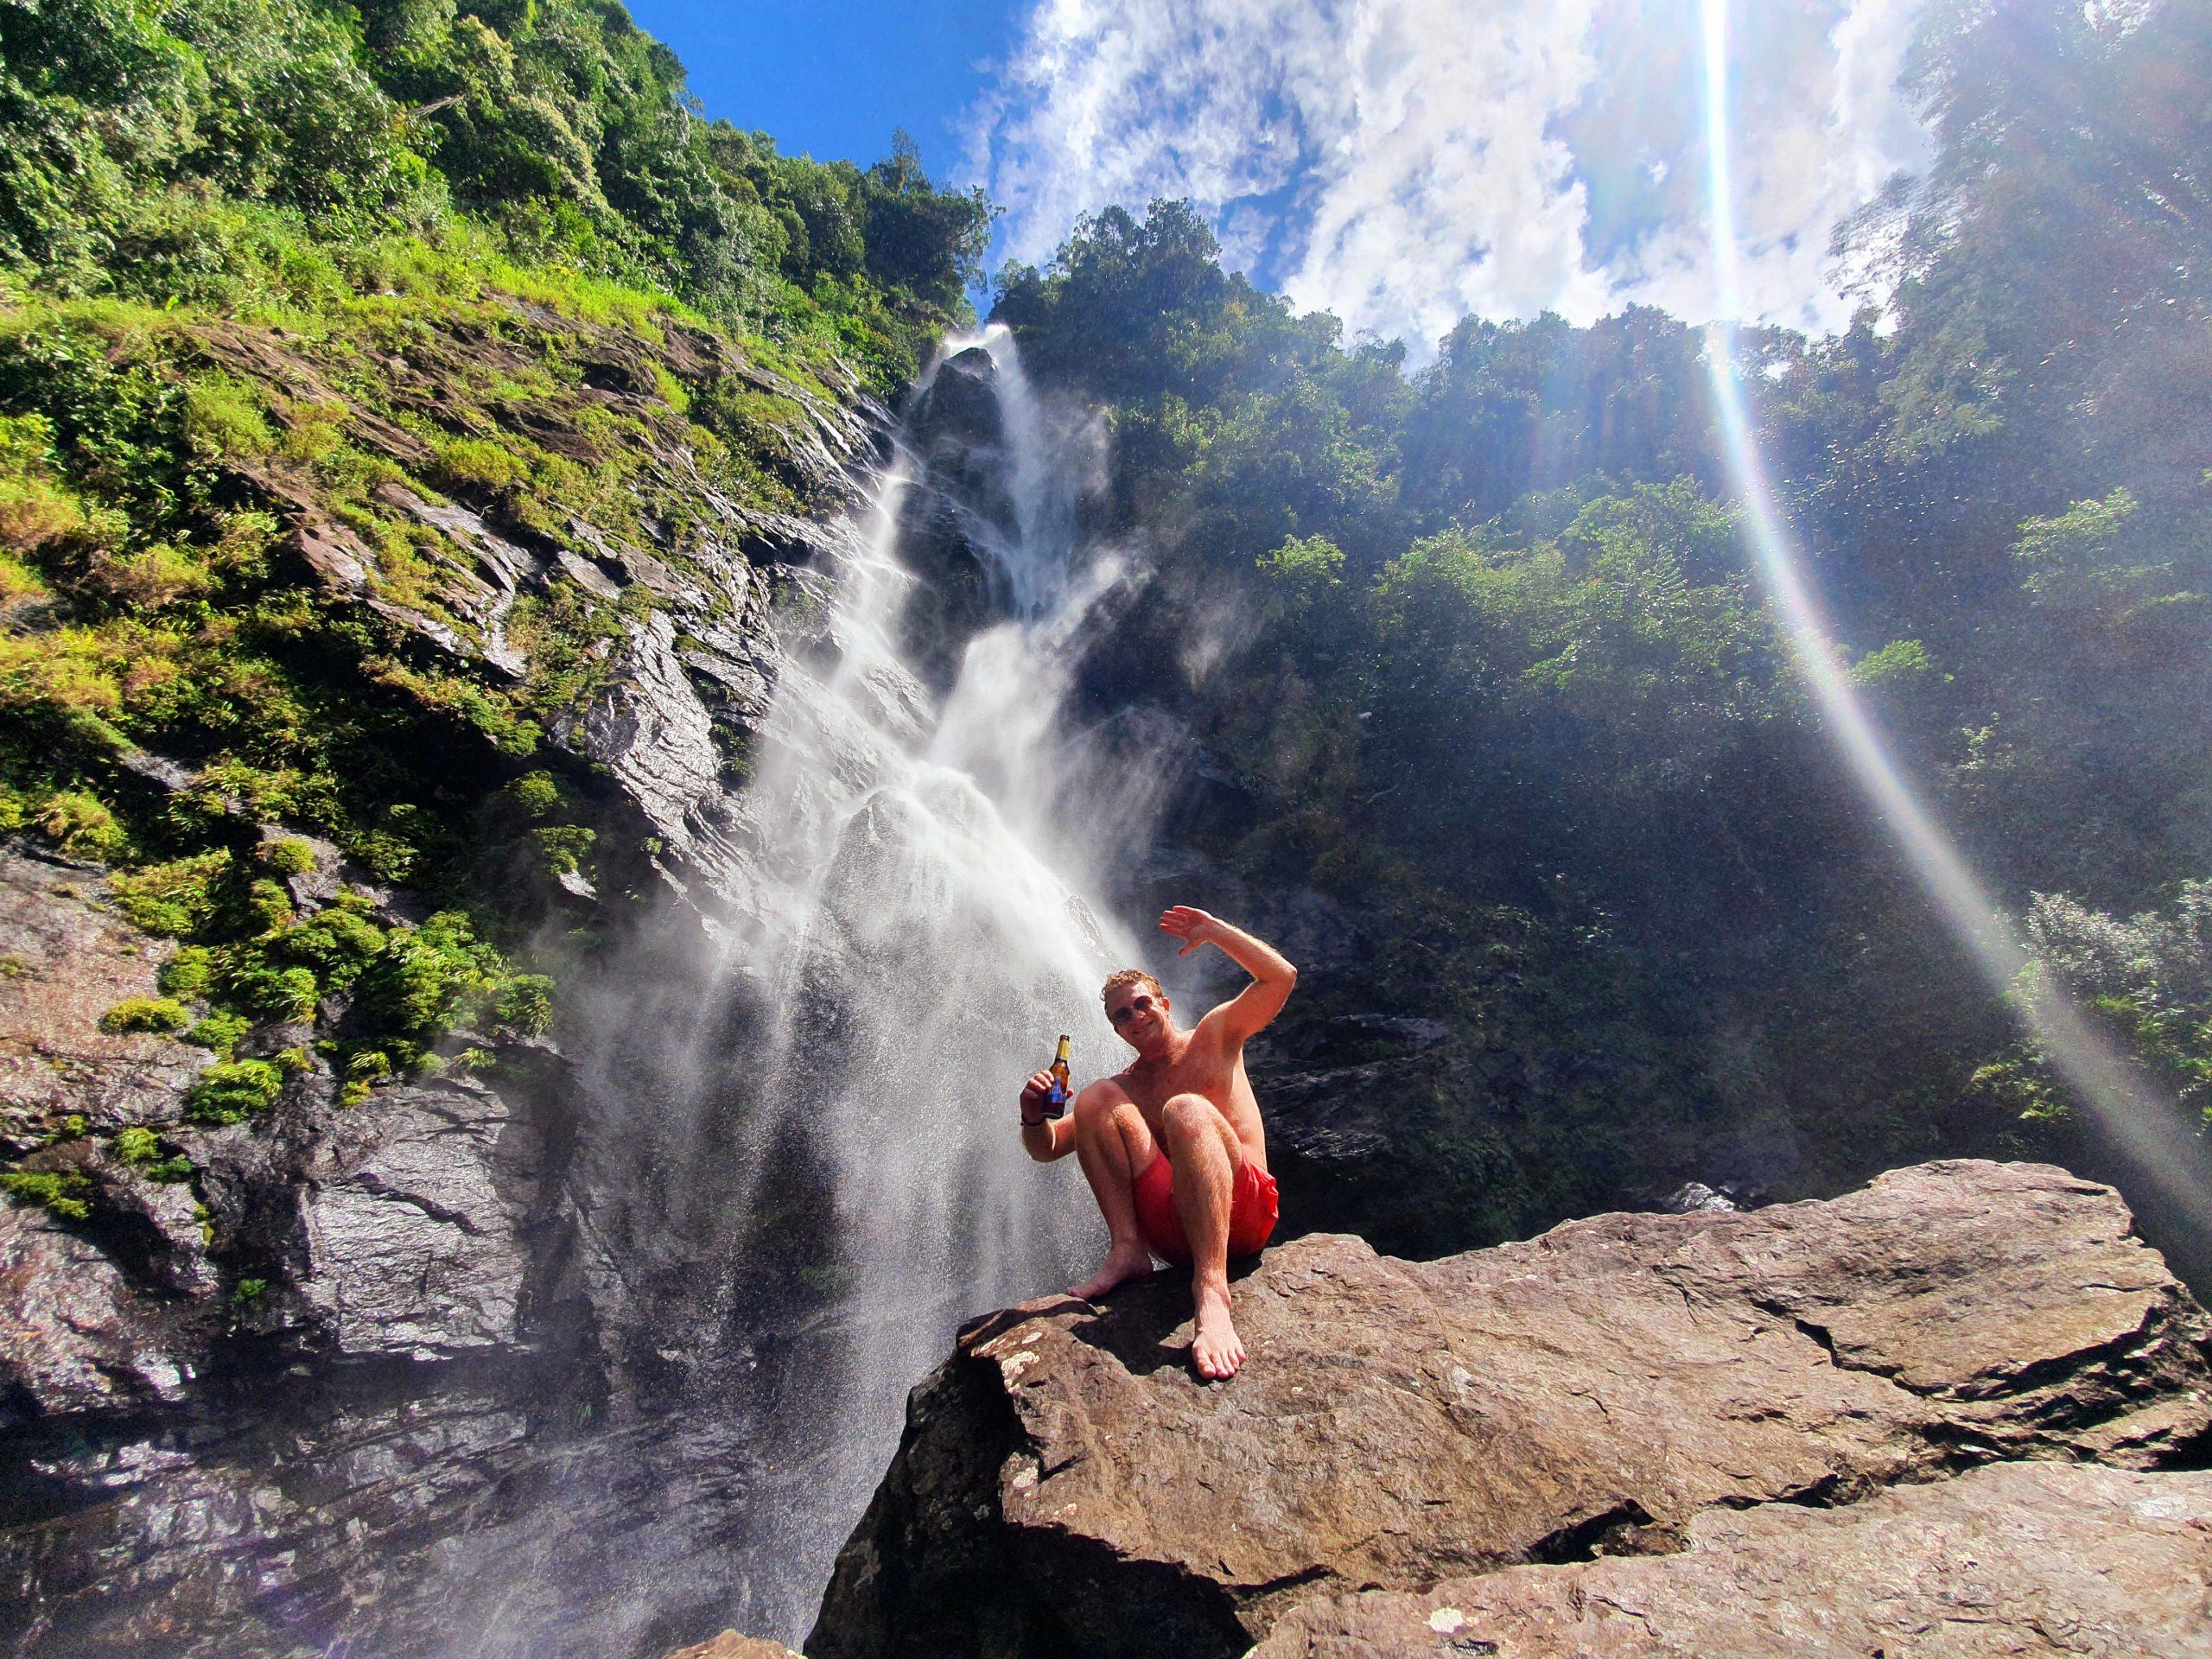 Colombia Cocorna Santo Domingo Hike Waterval Biertje